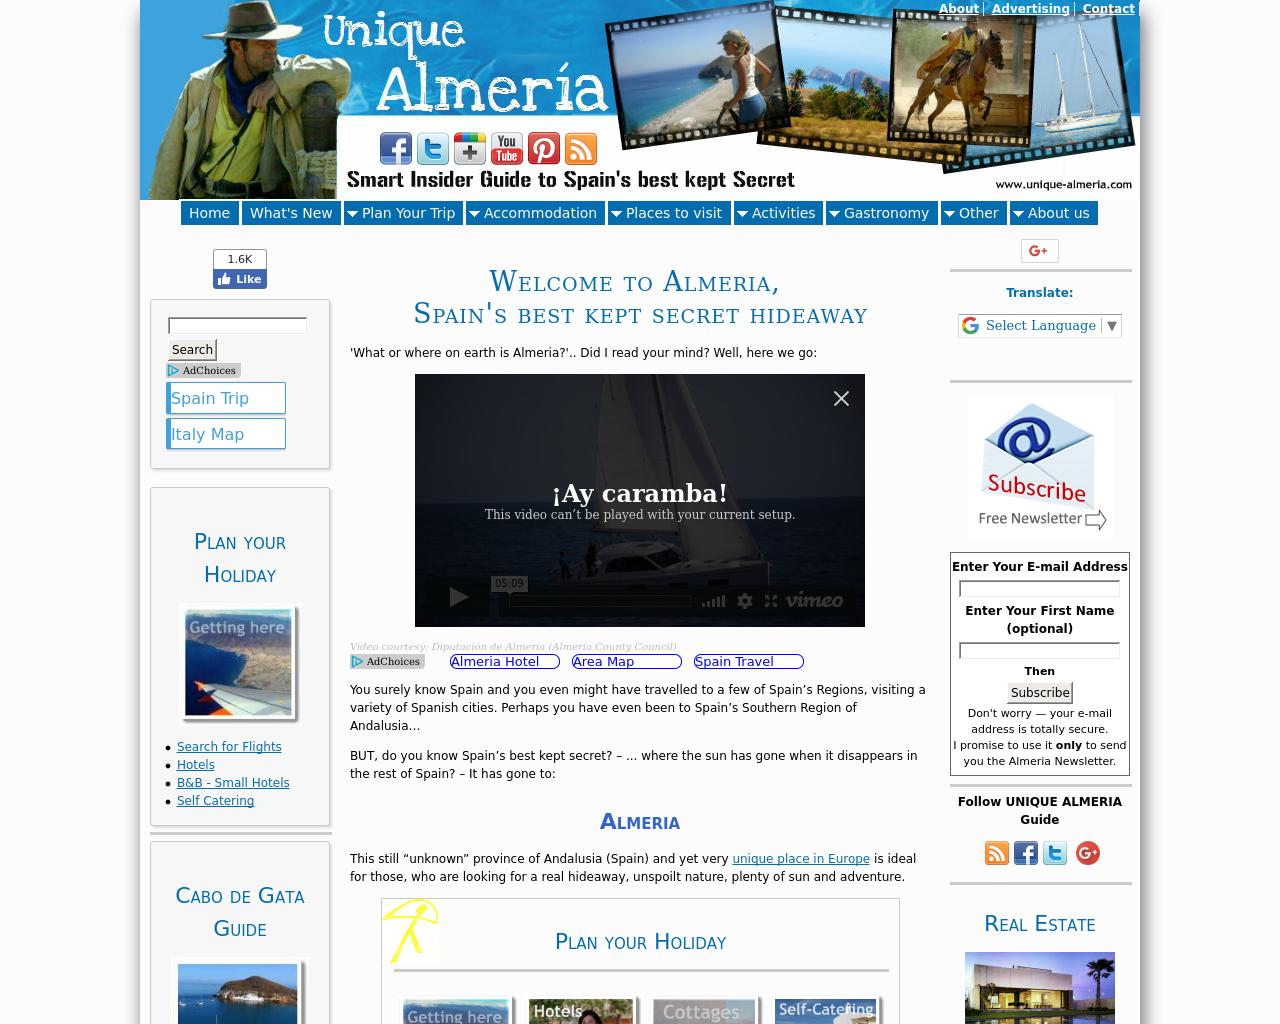 Unique-Almeria-Advertising-Reviews-Pricing